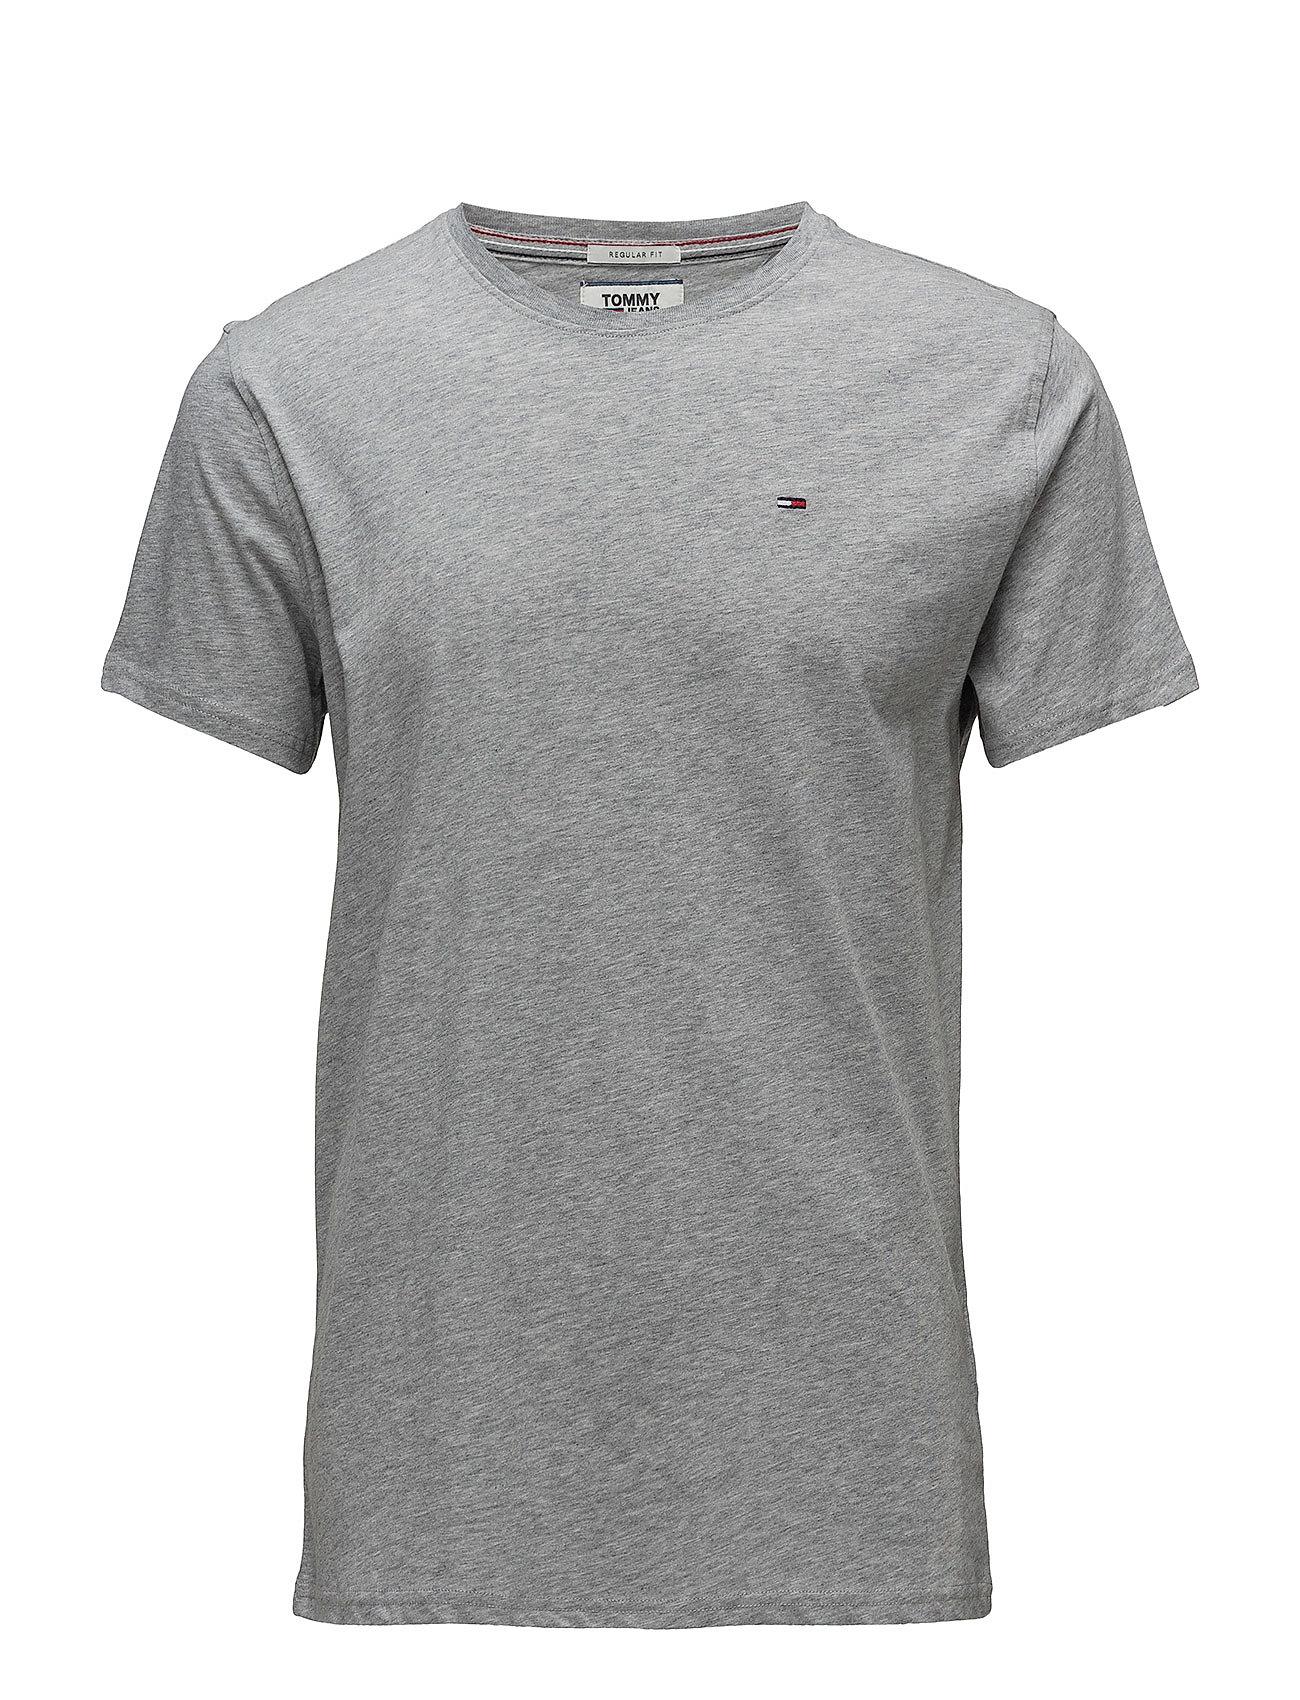 Tommy Jeans - TJM ORIGINAL JERSEY TEE - basic t-shirts - lt grey htr - 0